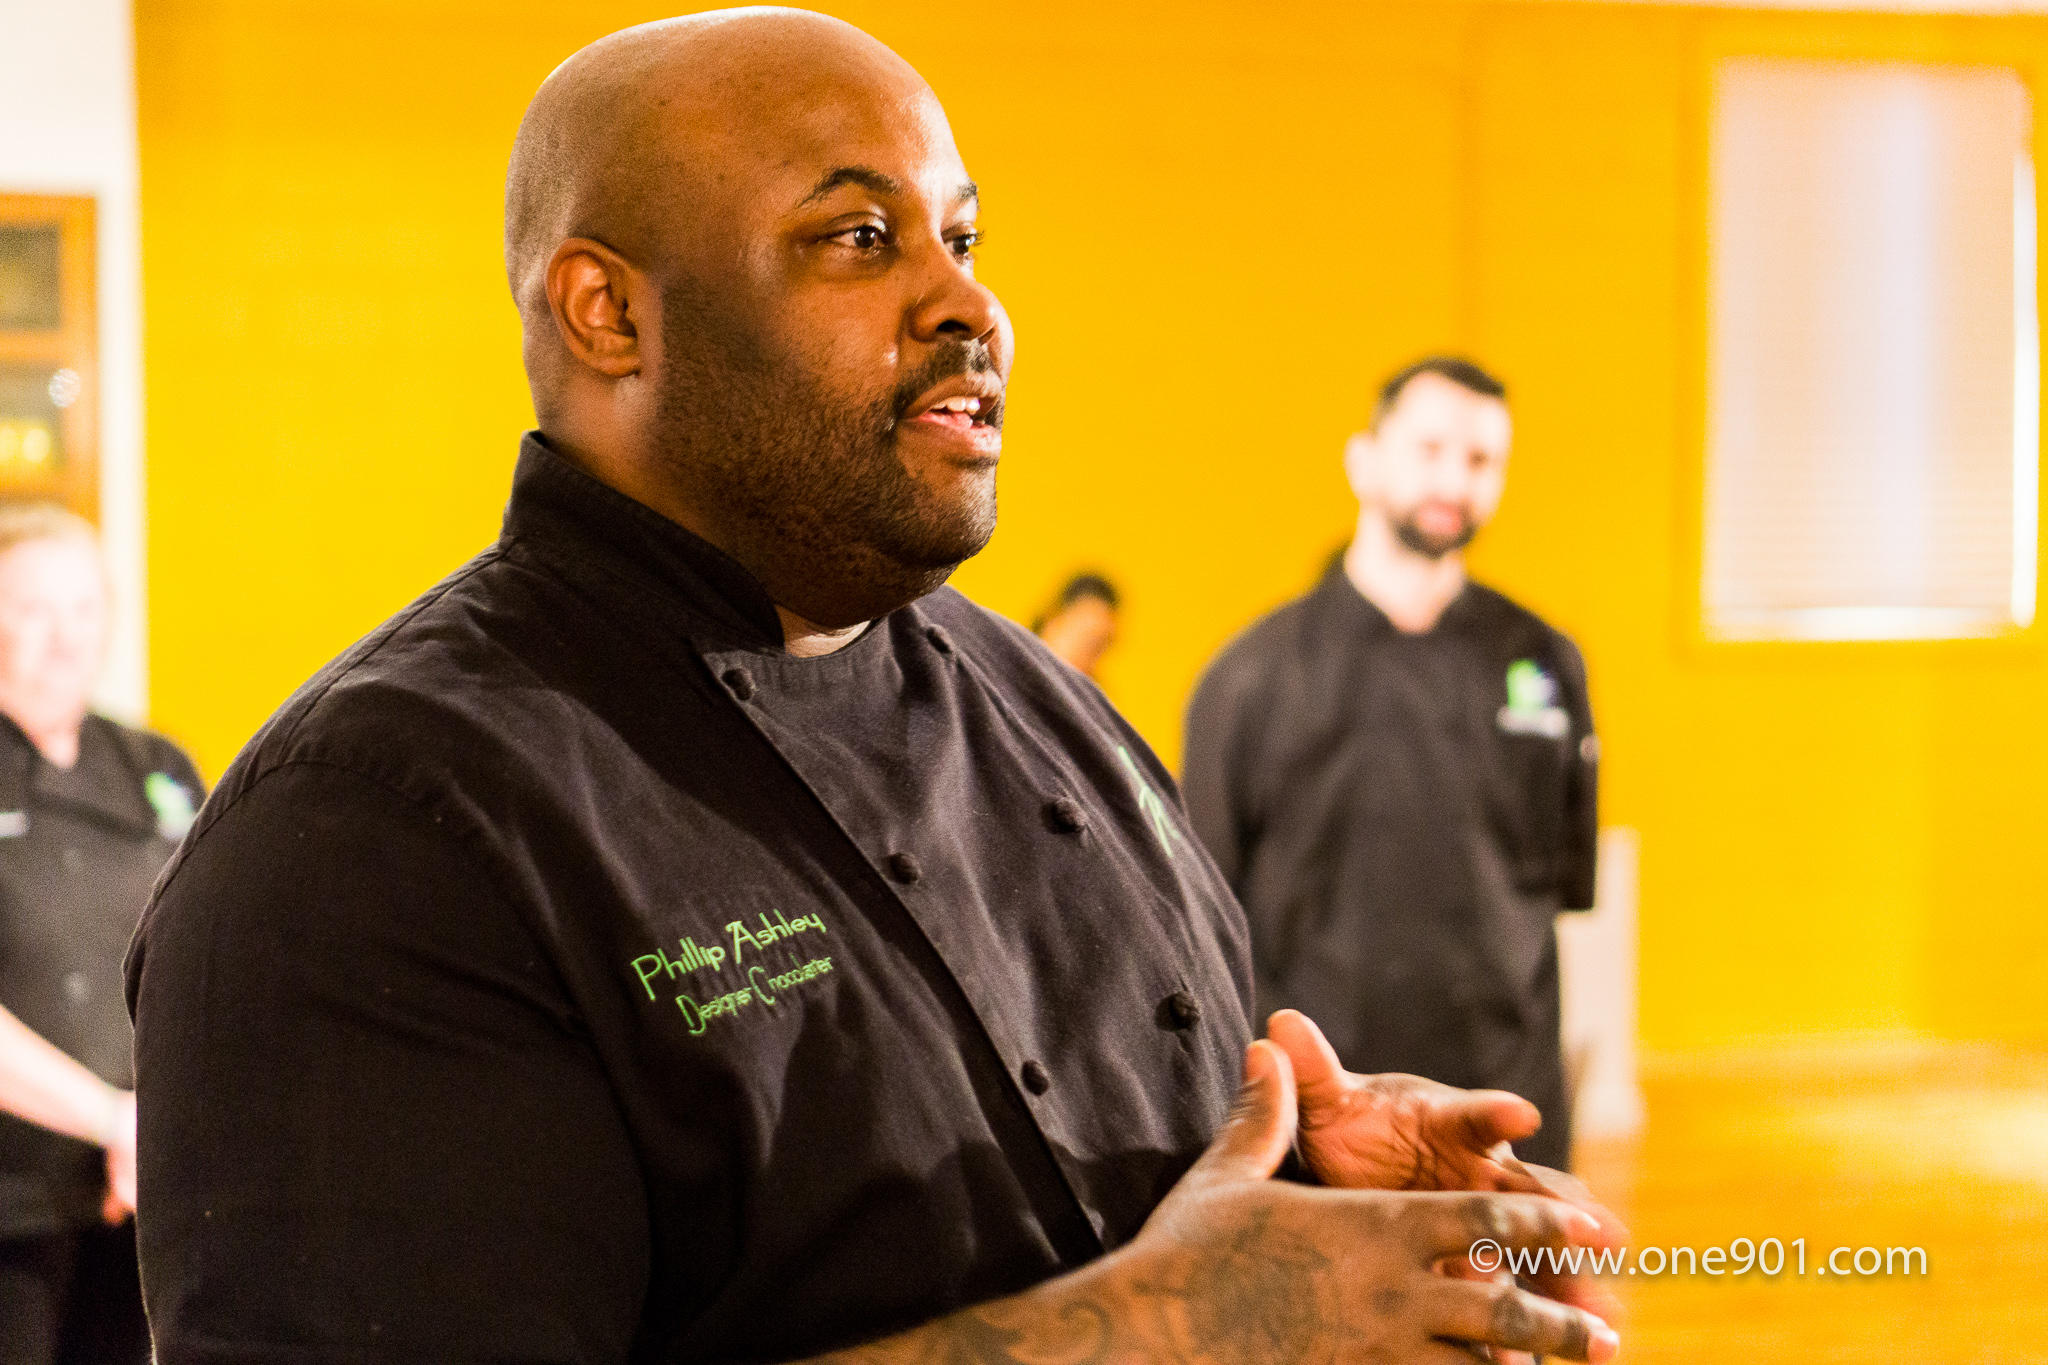 Chef Phillip Ashley